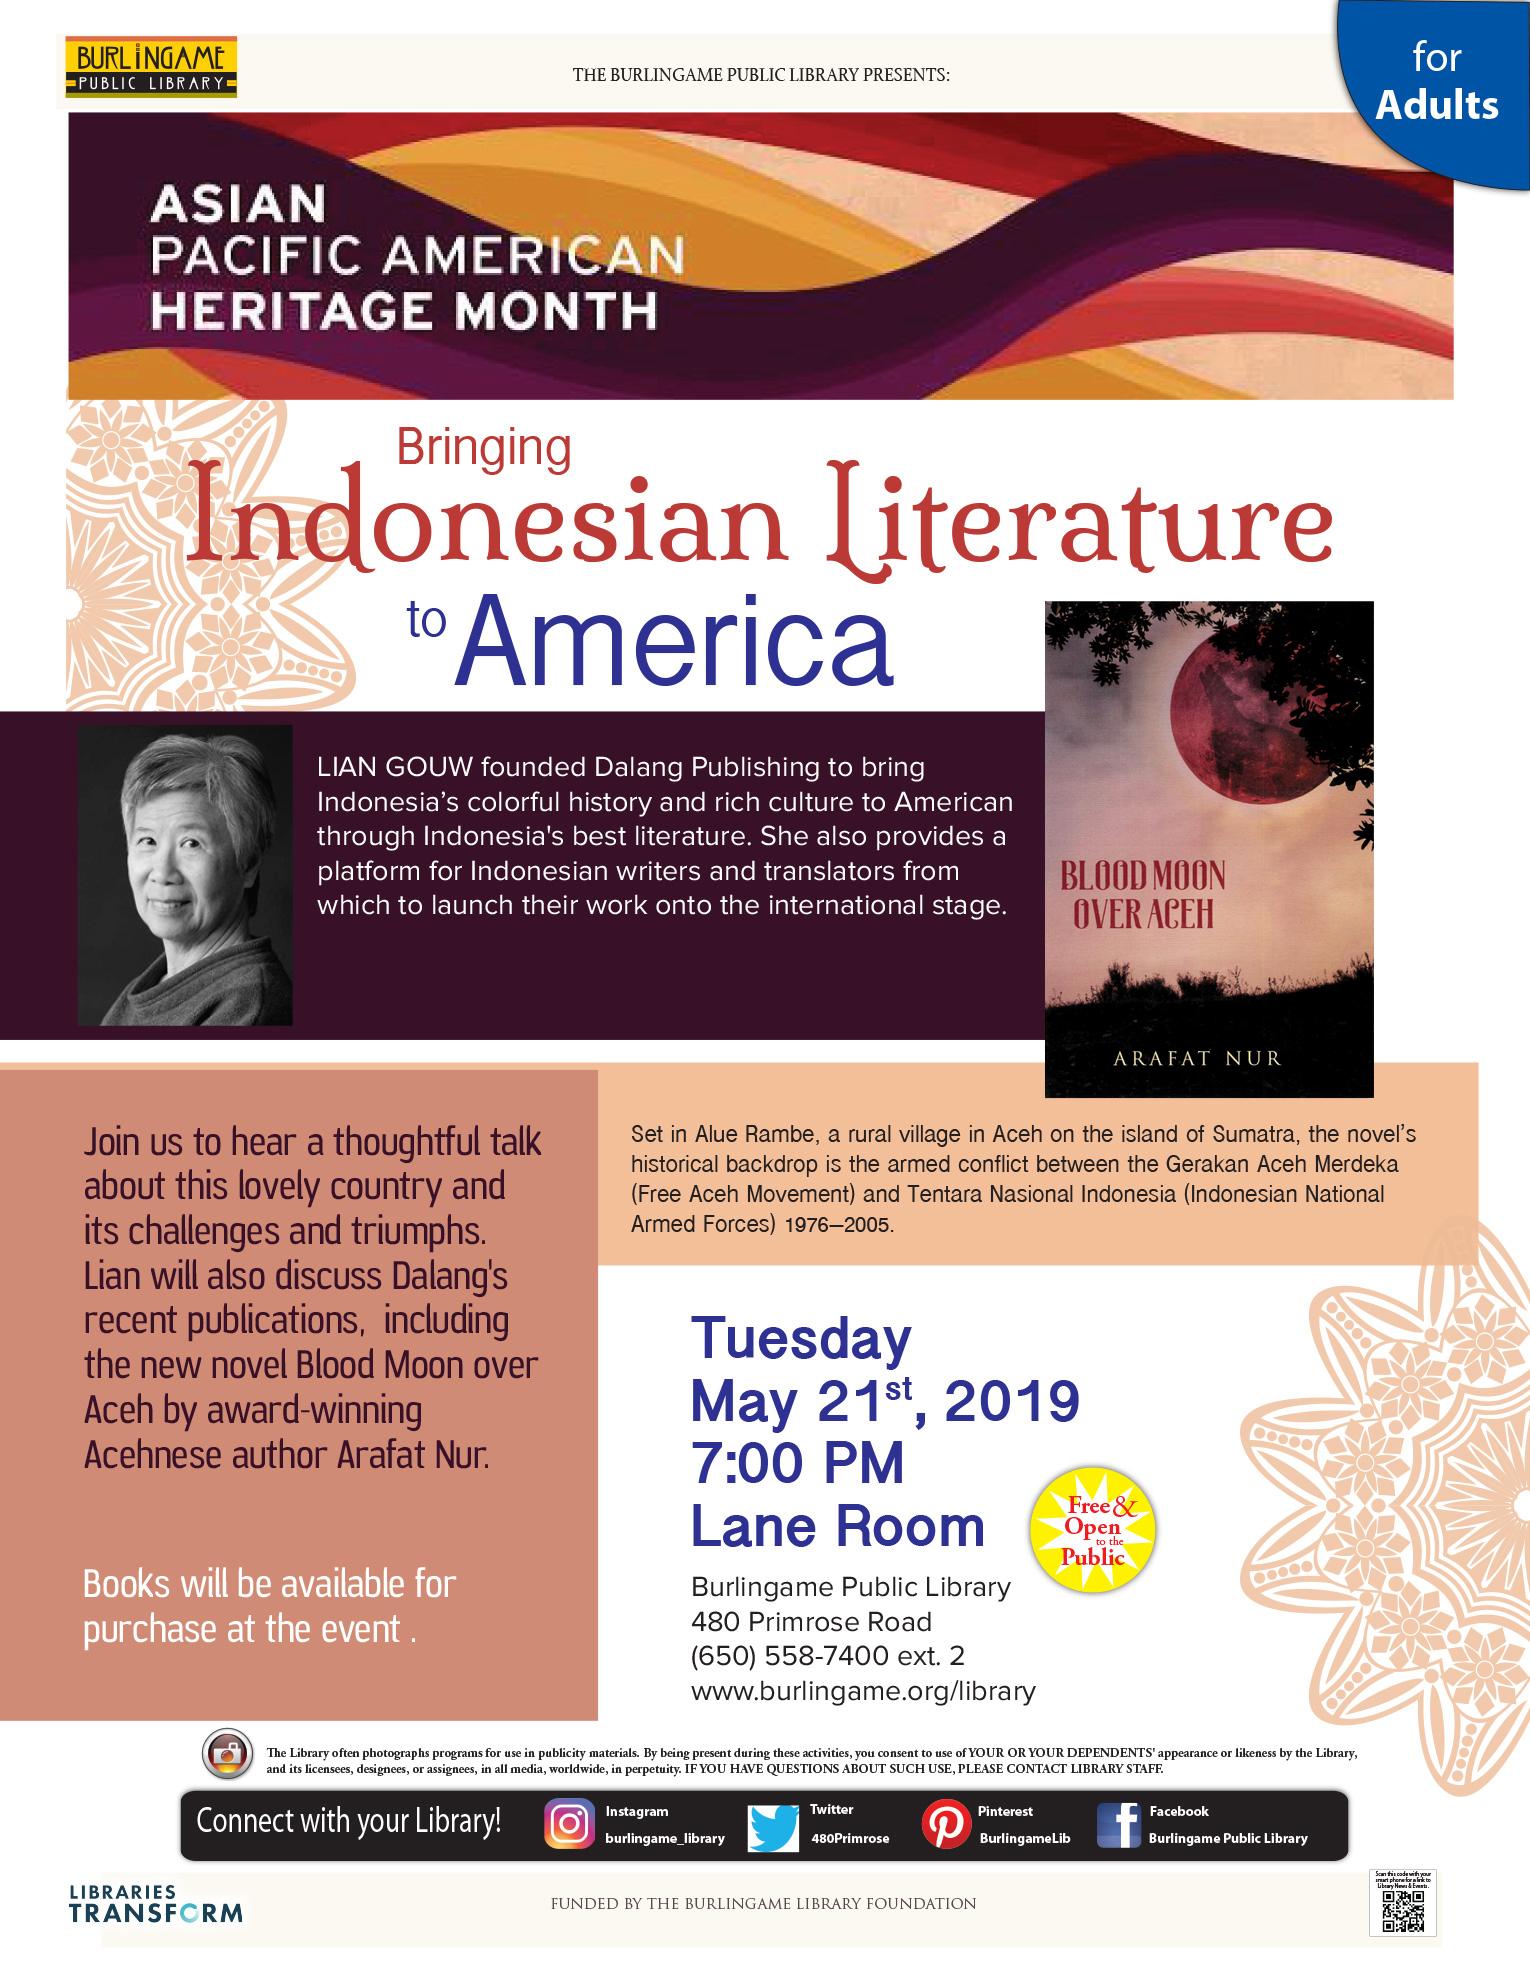 Bringing Indonesian Literature to American